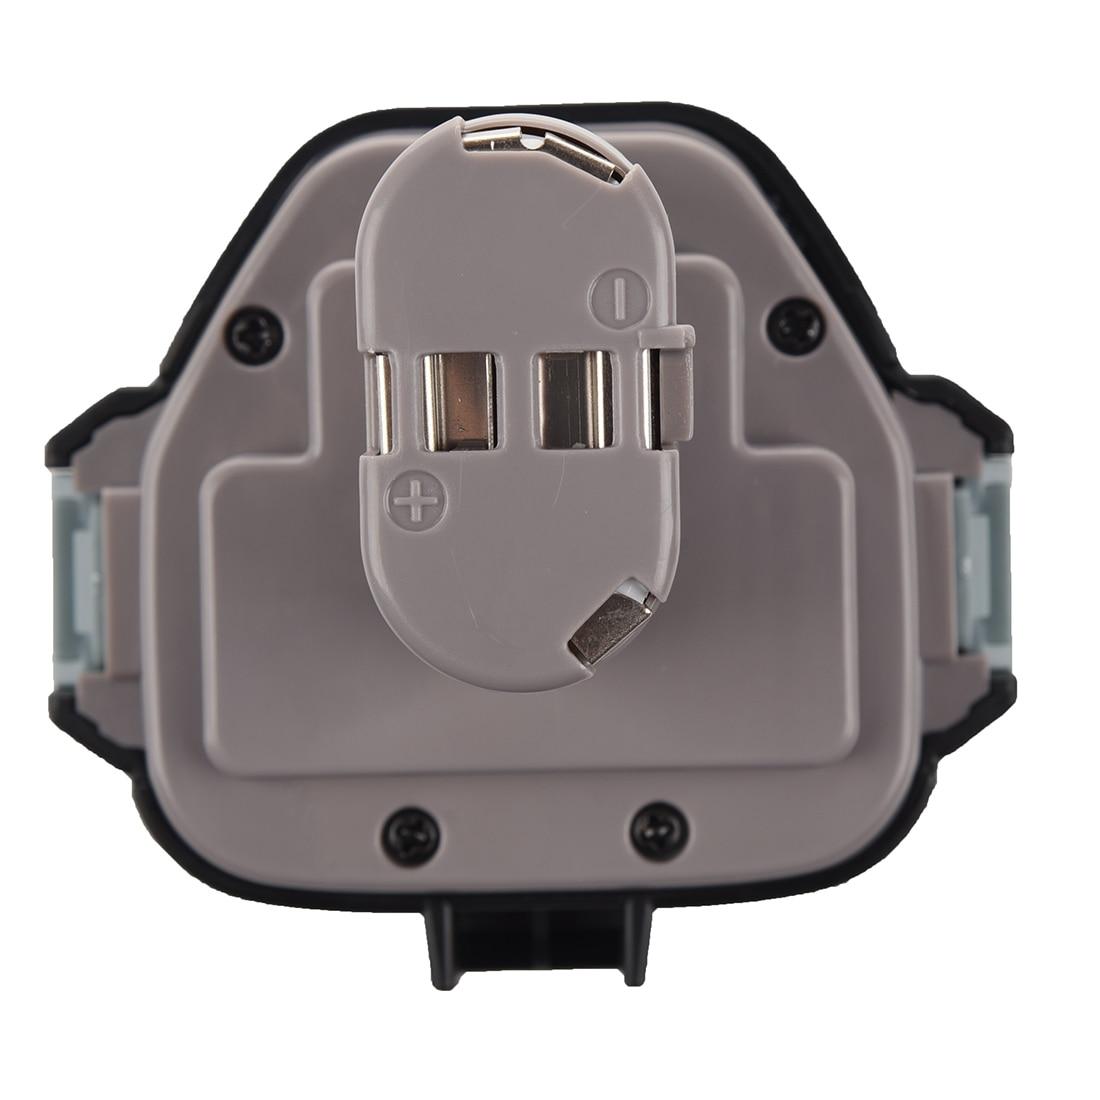 Set Sale NEW 12 VOLT Ni-MH Battery For MAKITA 3.0 Ah 1233 1234 Black&Gray